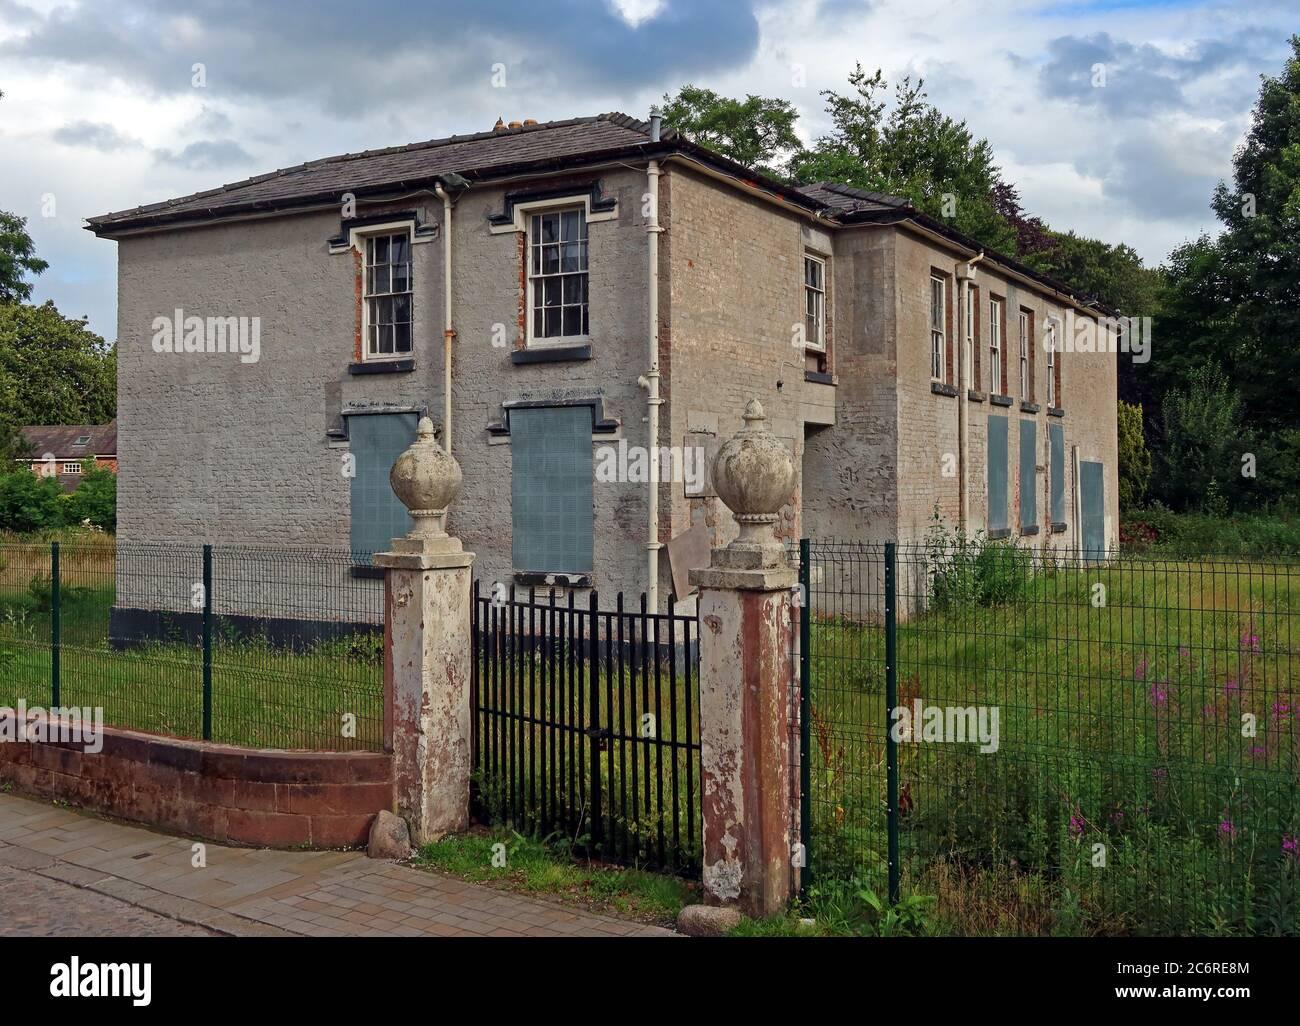 GoTonySmith,HotpixUK,@HotpixUK,England,Cheshire,UK,Thelwall,building,25 years,left,25,years,state of disrepair,state,disrepair,WBC,Warrington Council,Warrington Borough Council,dilapidated